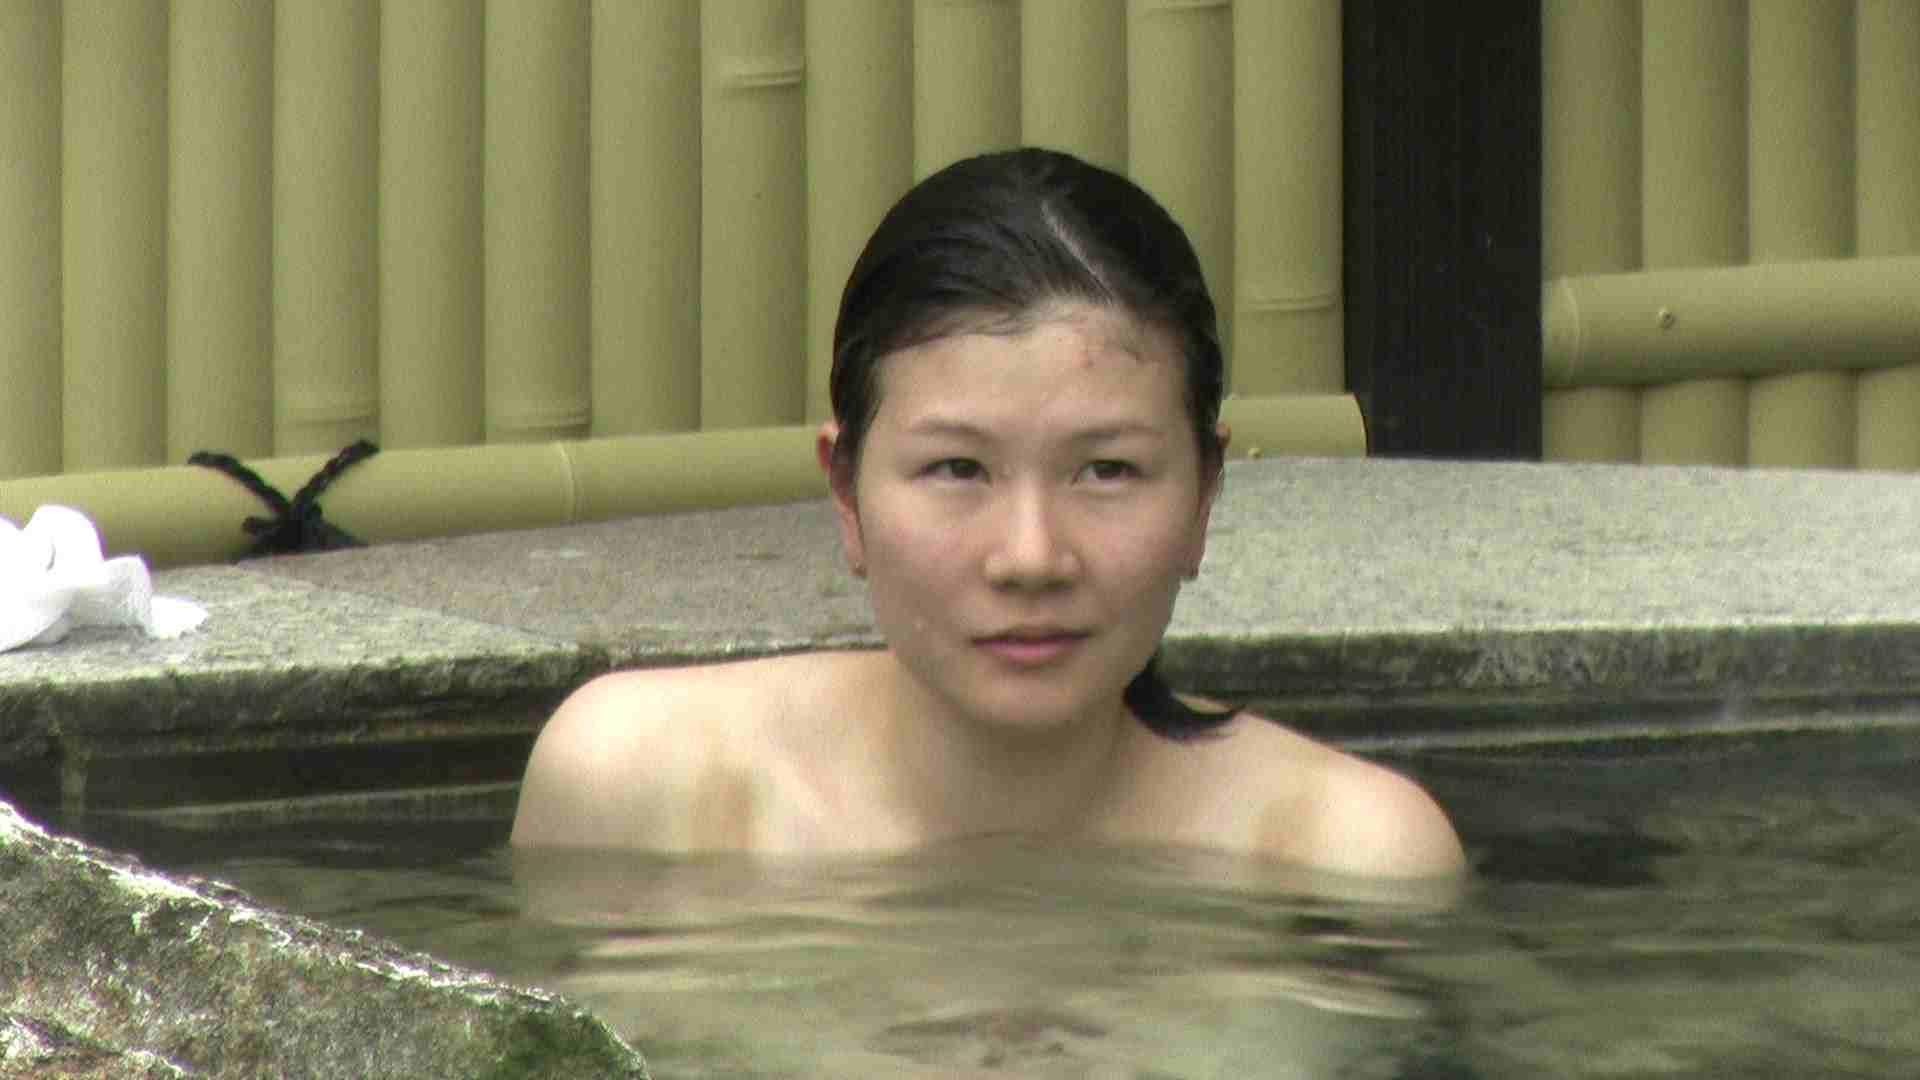 Aquaな露天風呂Vol.187 盗撮   HなOL  96pic 27